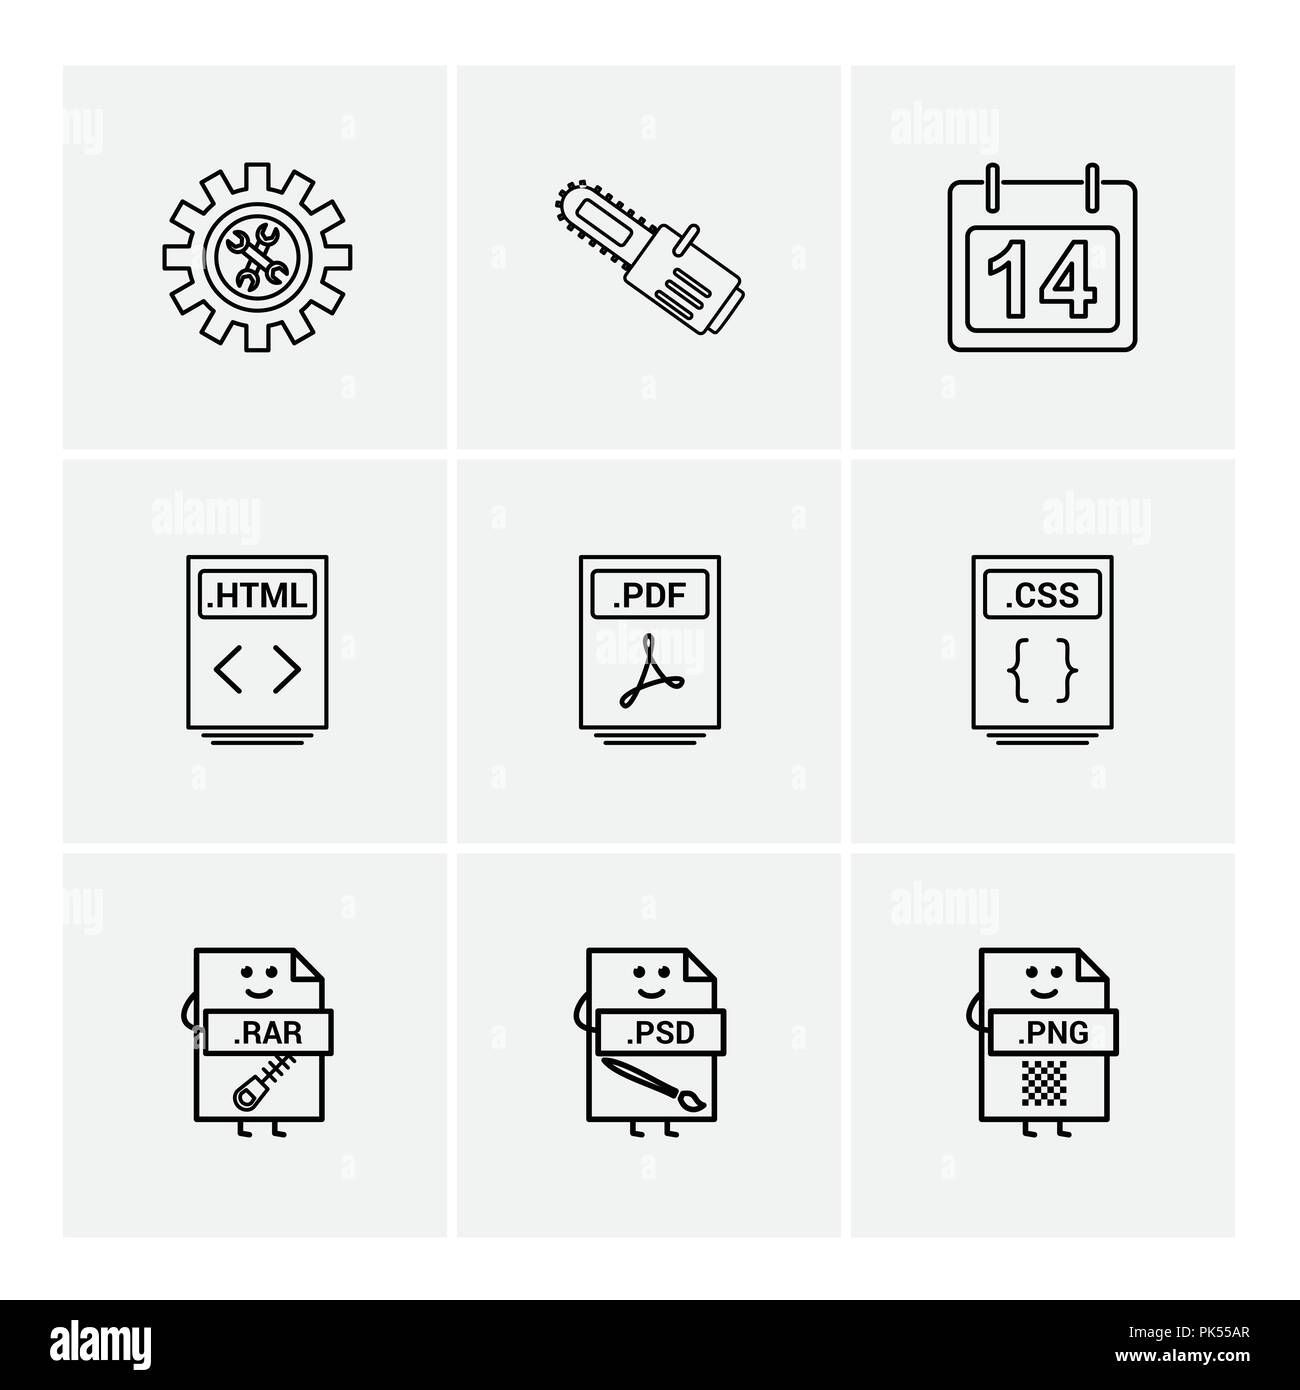 Html Calendario.Engranaje Fresa Calendario Archivo Html Pdf